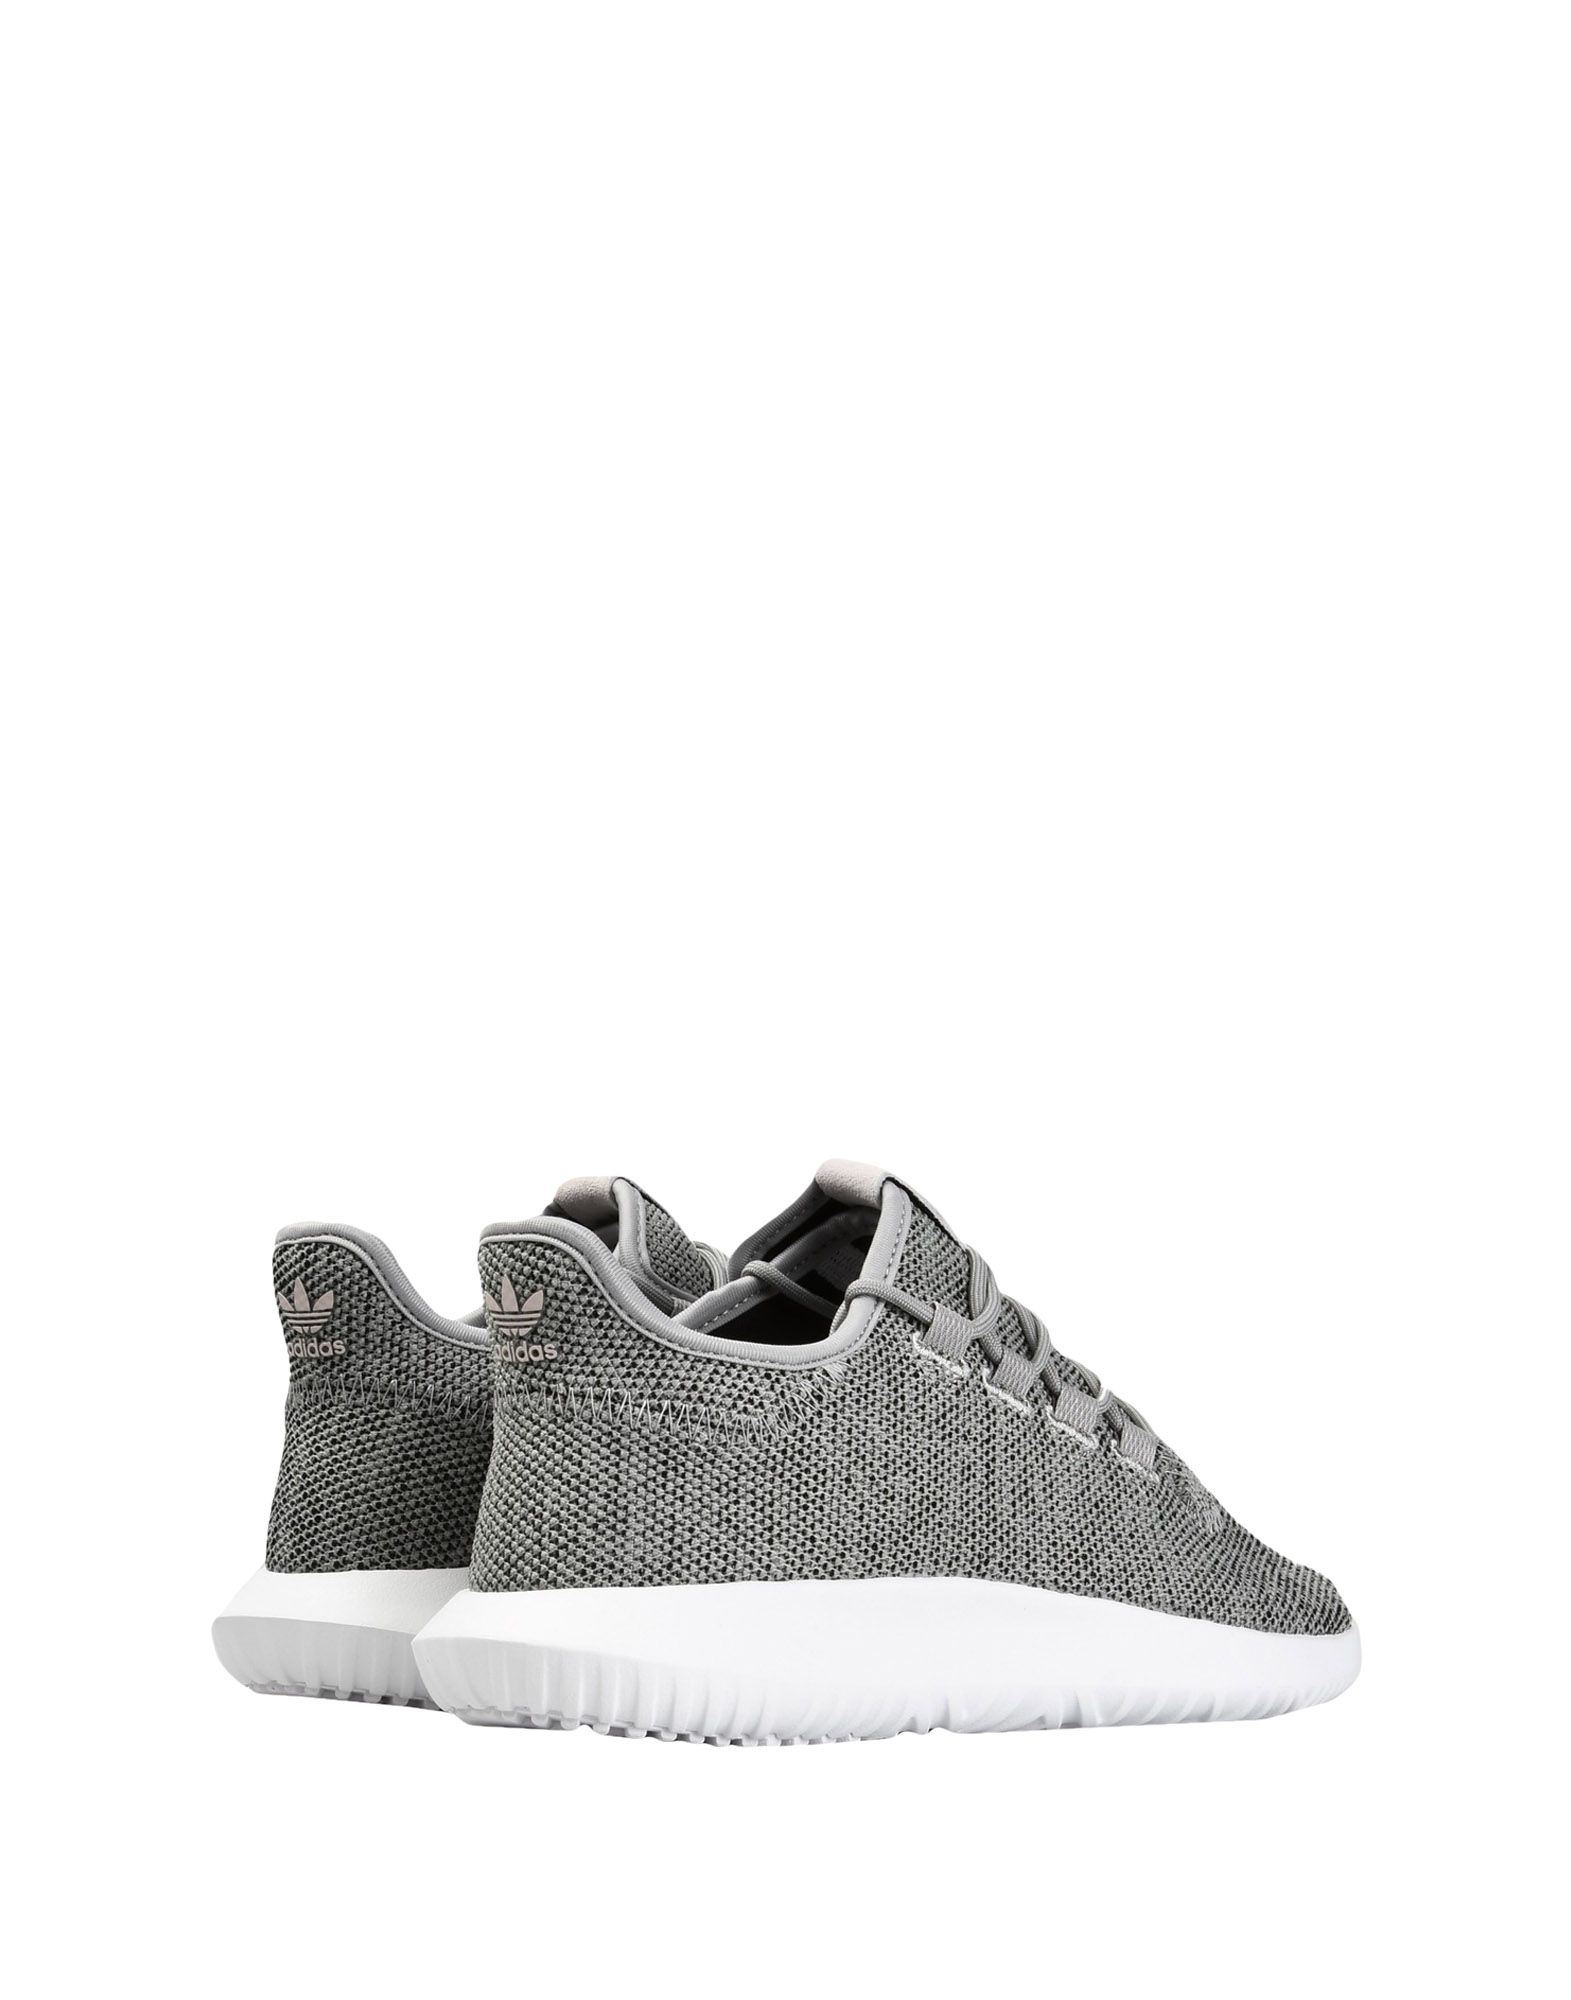 Adidas Originals Tubular Shadow W  11205457HU 11205457HU 11205457HU Gute Qualität beliebte Schuhe f084fb